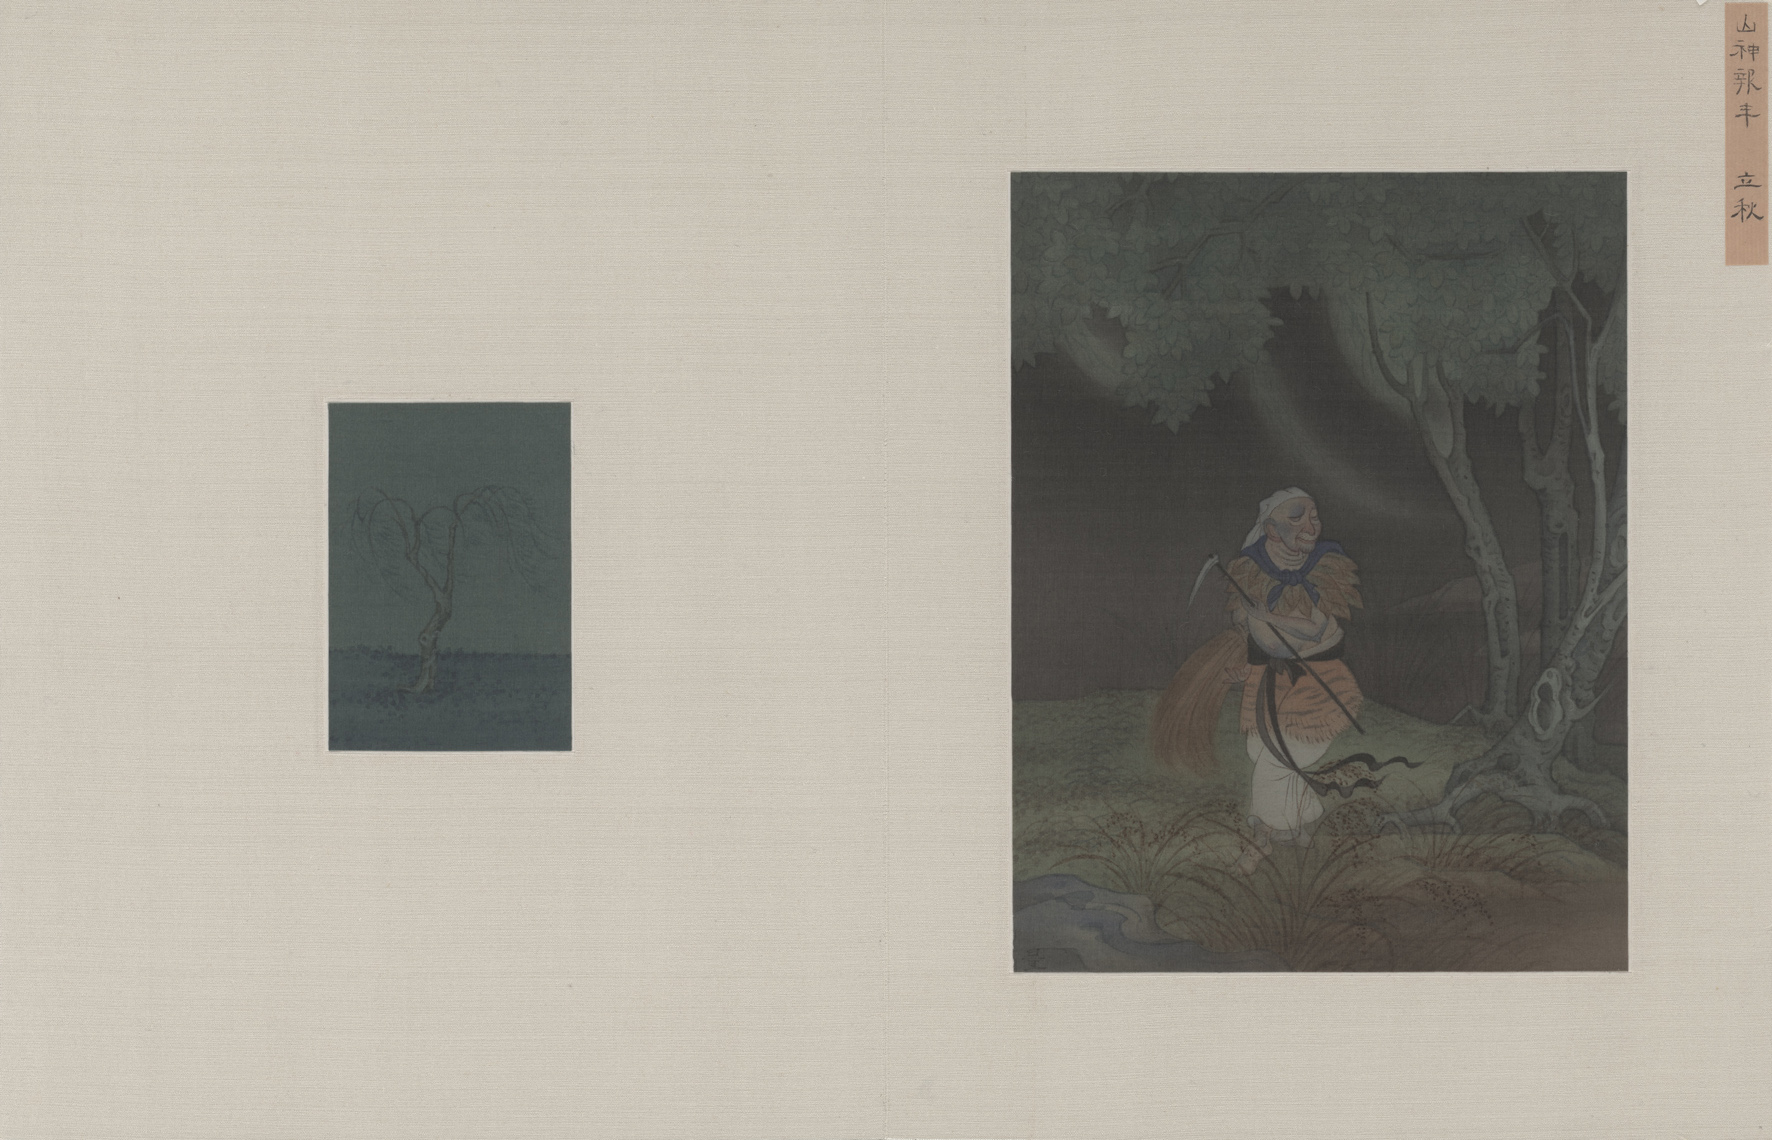 Hao Liang 郝量, Mountain God Brings Prosperity 山神报丰, 2013, Ink and color on silk 绢本重彩, 6.5 x 9.5 cm (left 左) and 17 x 22 cm (right 右)